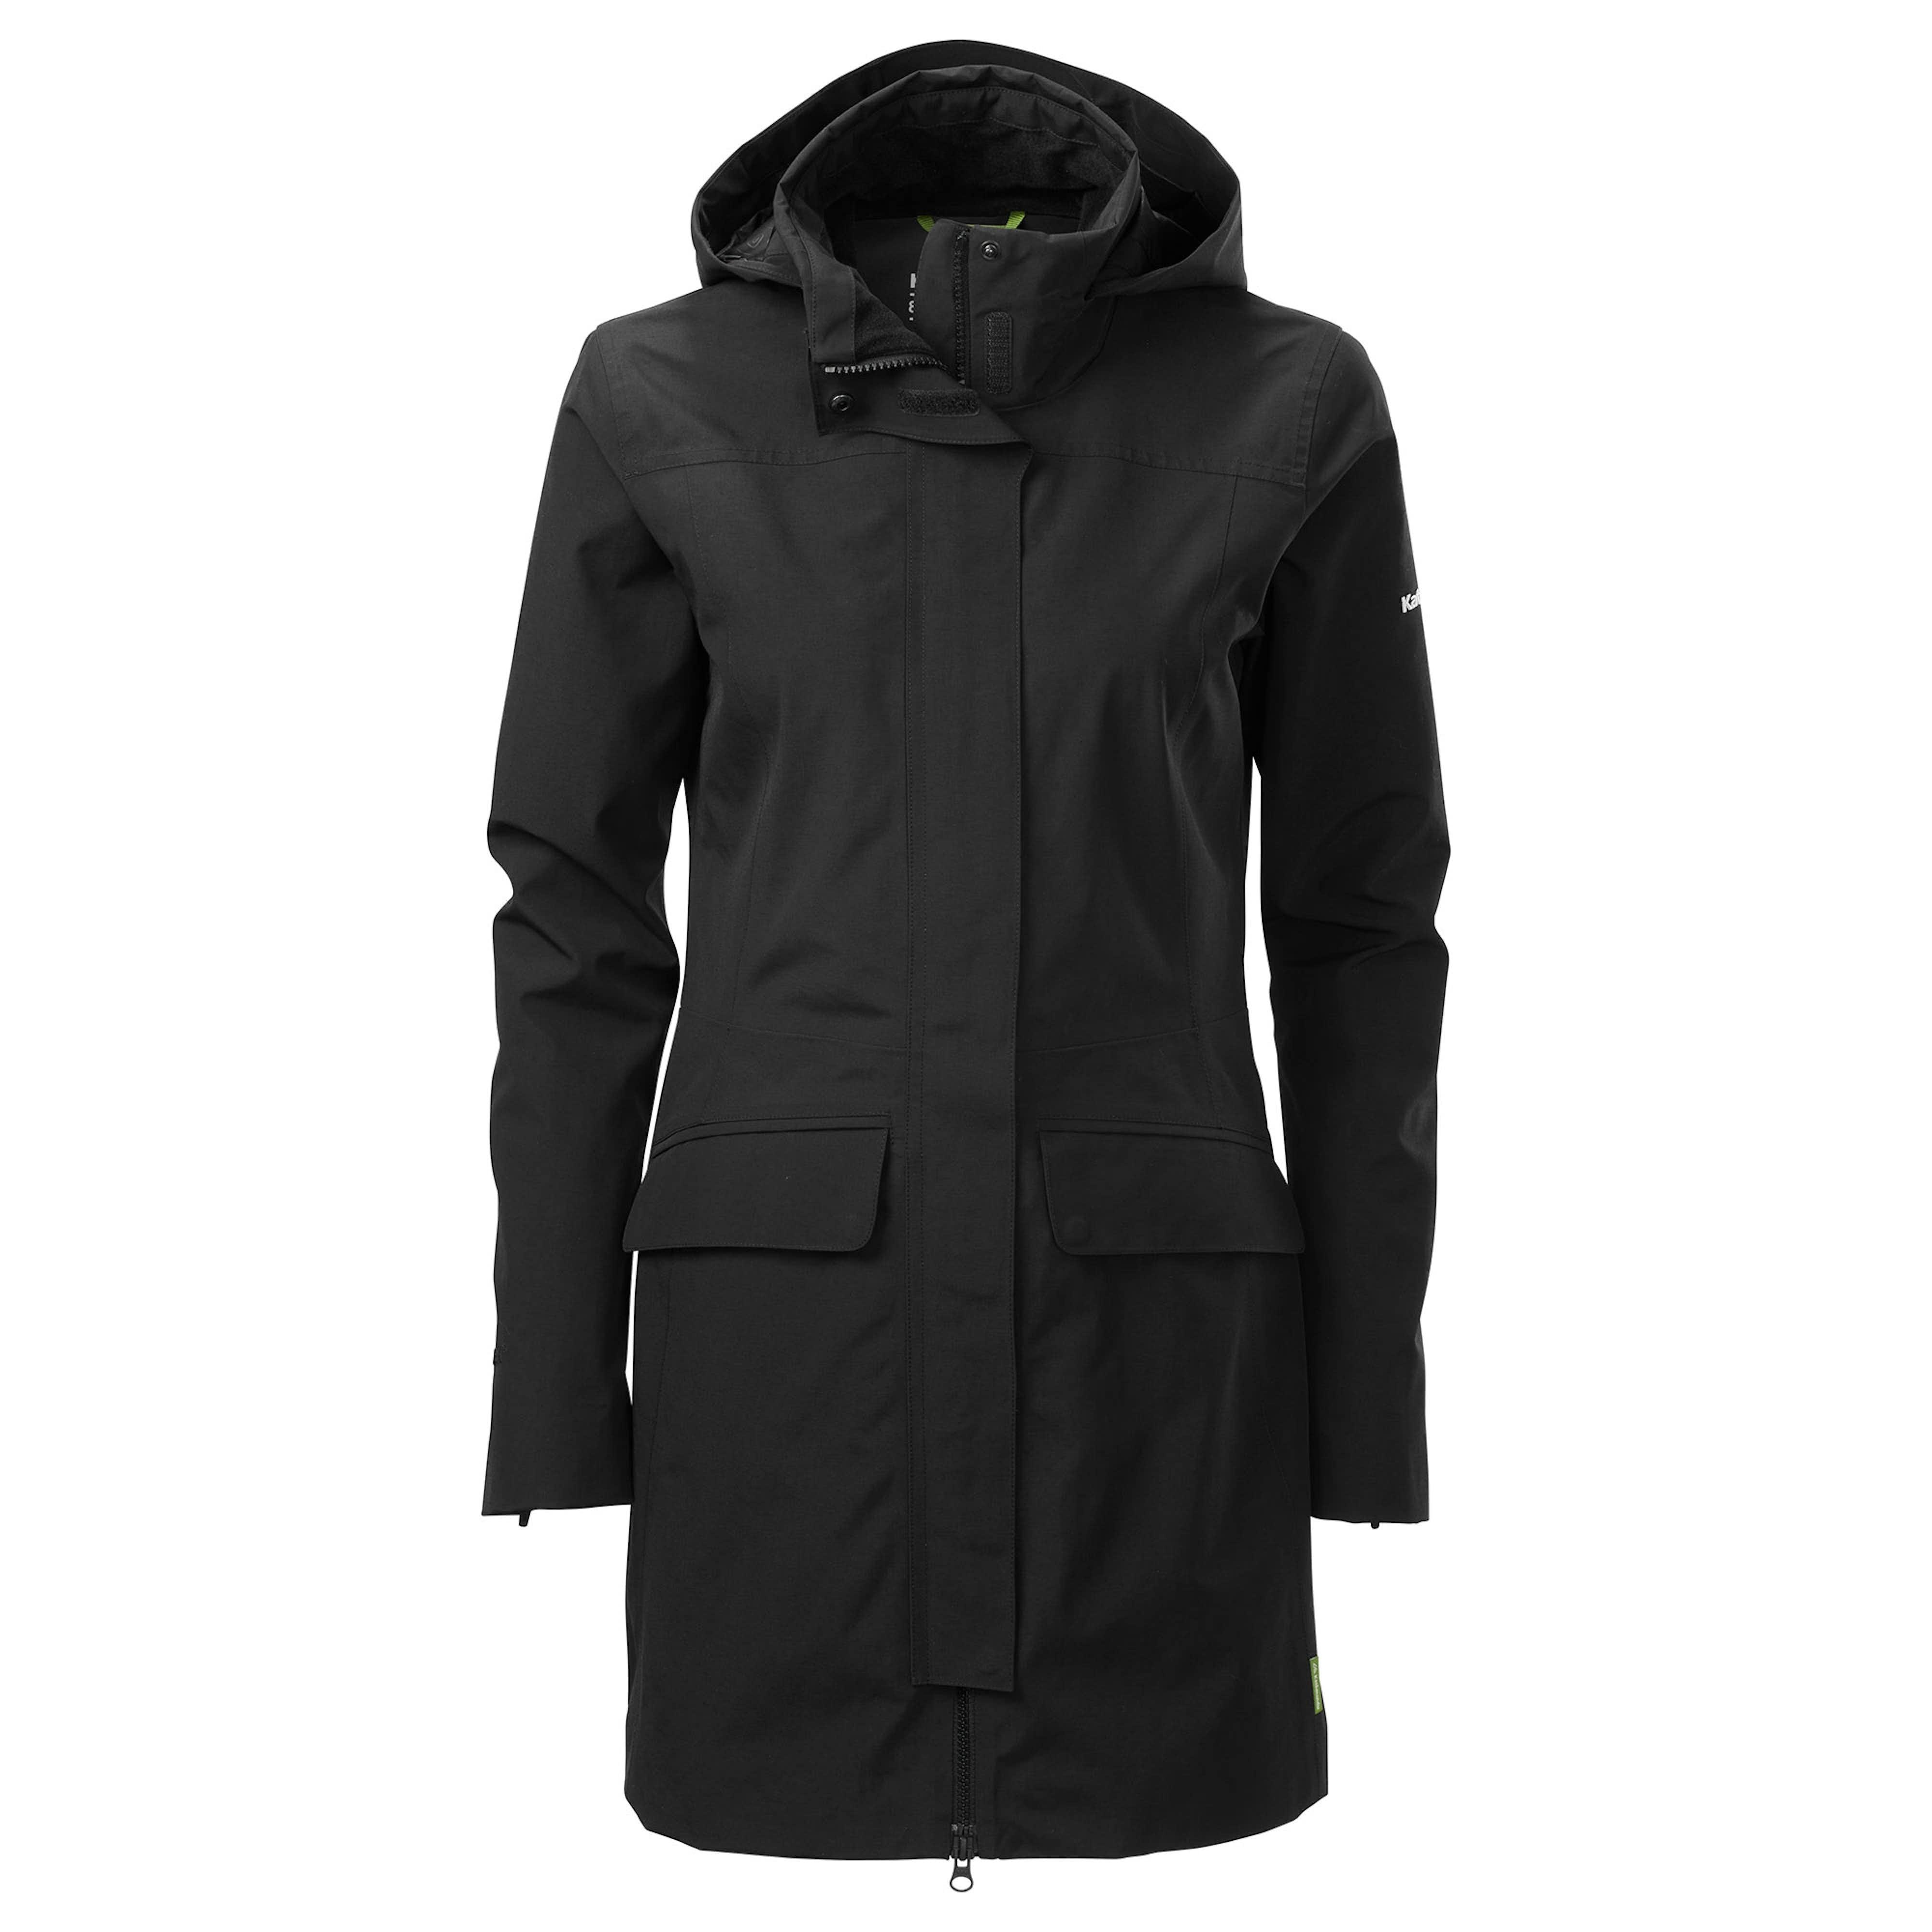 d45bf405f Women's Rain Jackets & Raincoats | Waterproof & Lightweight | US